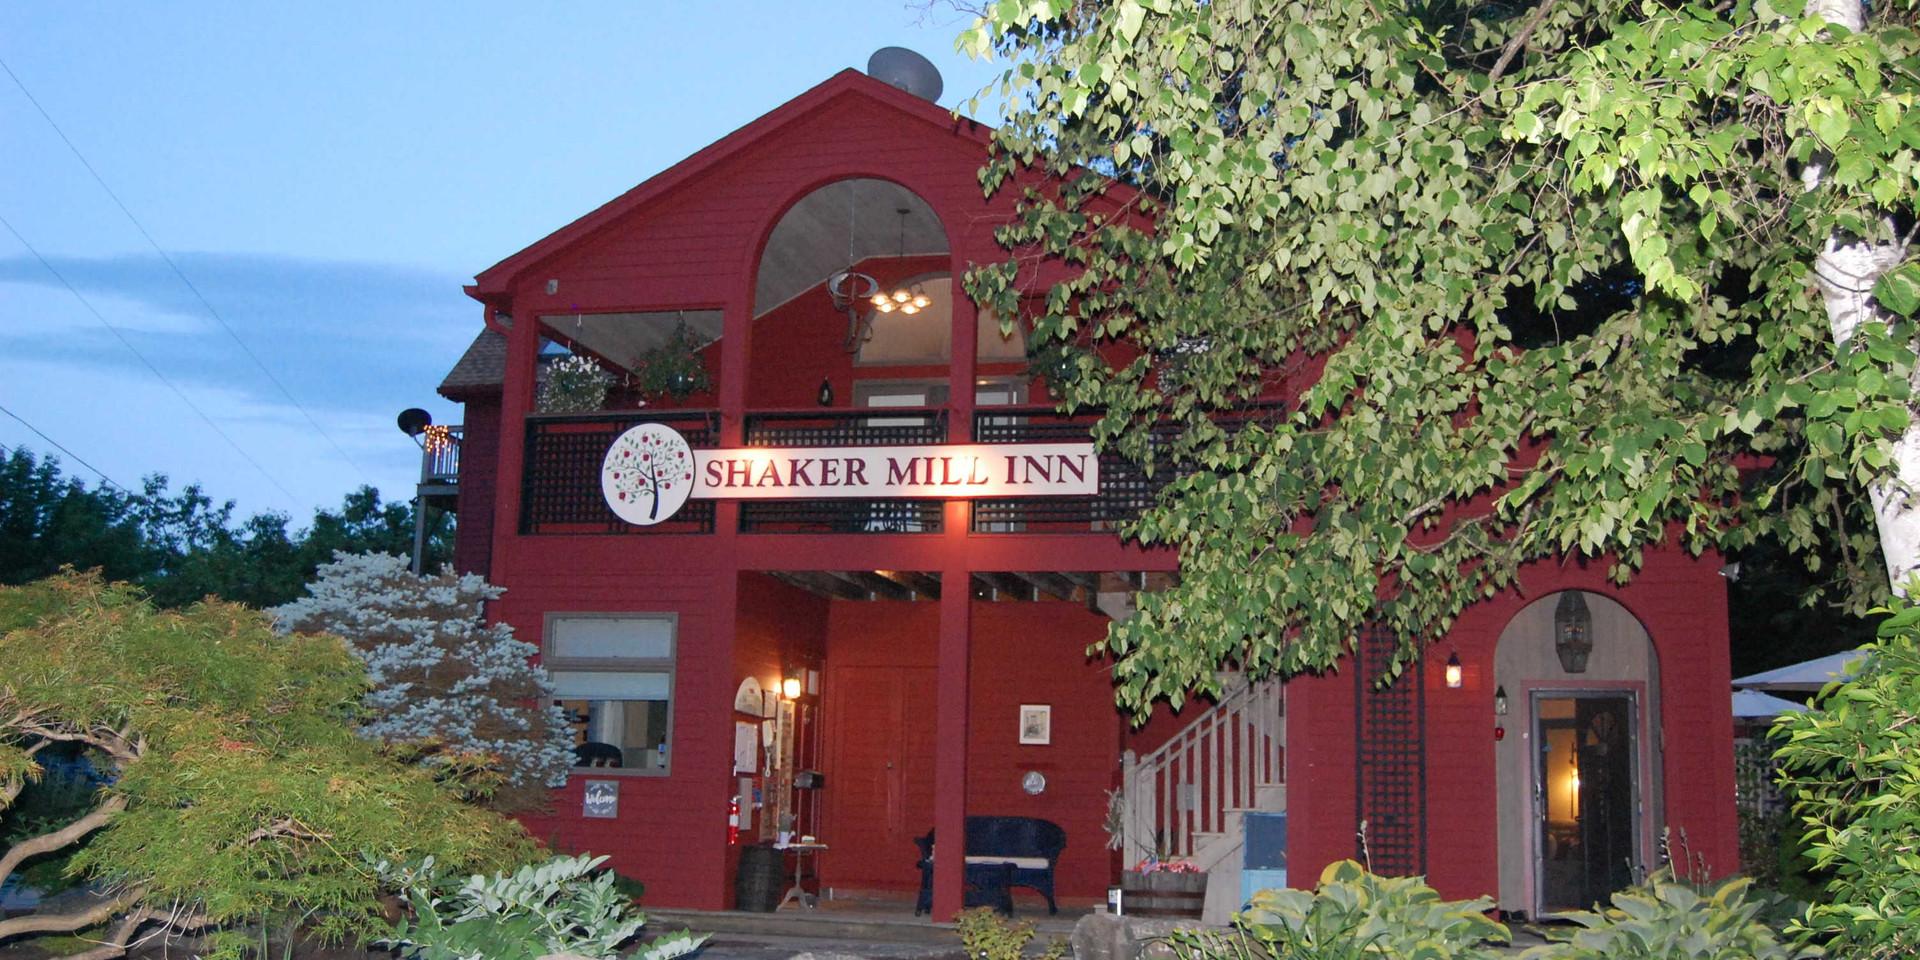 Nighttime at the Shaker Mill Inn